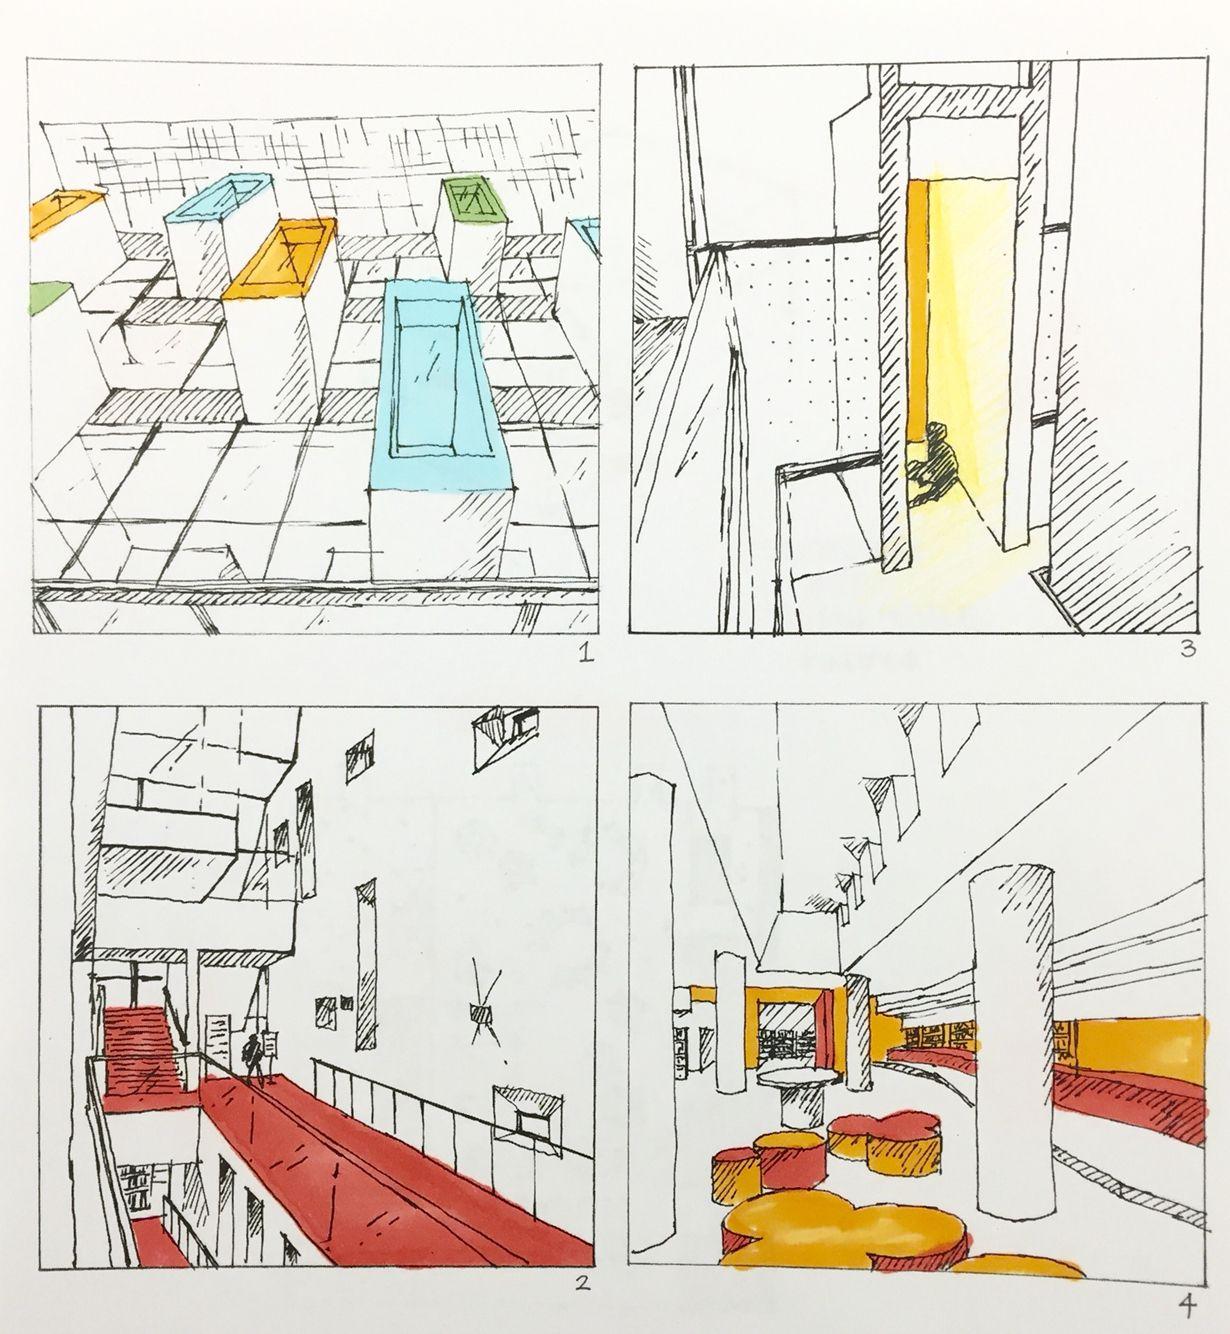 Study Area Suggestions : singapore - Reddit